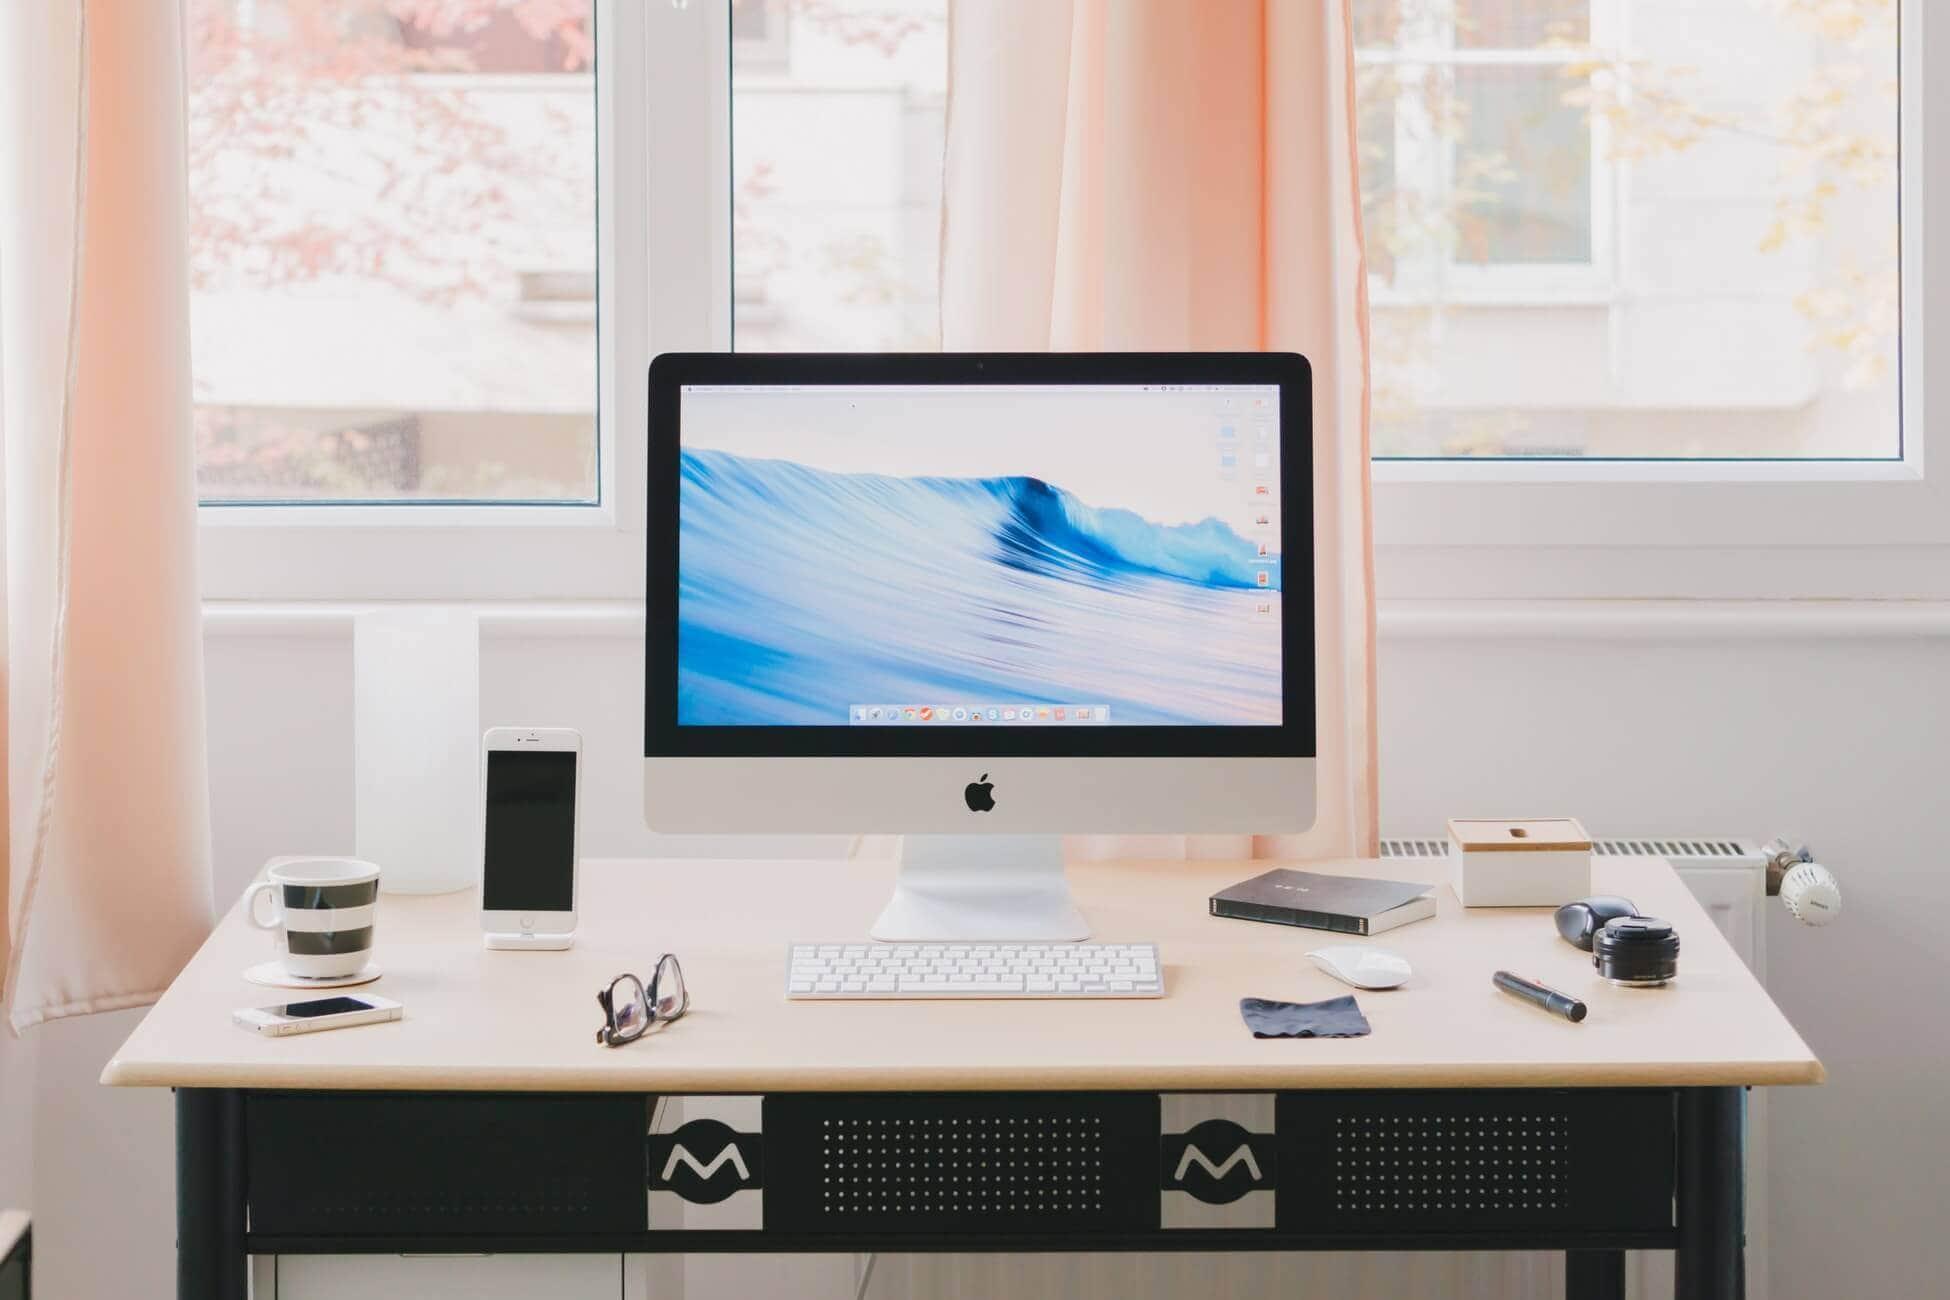 Home-Office-Desk-Setup-Ideas-05